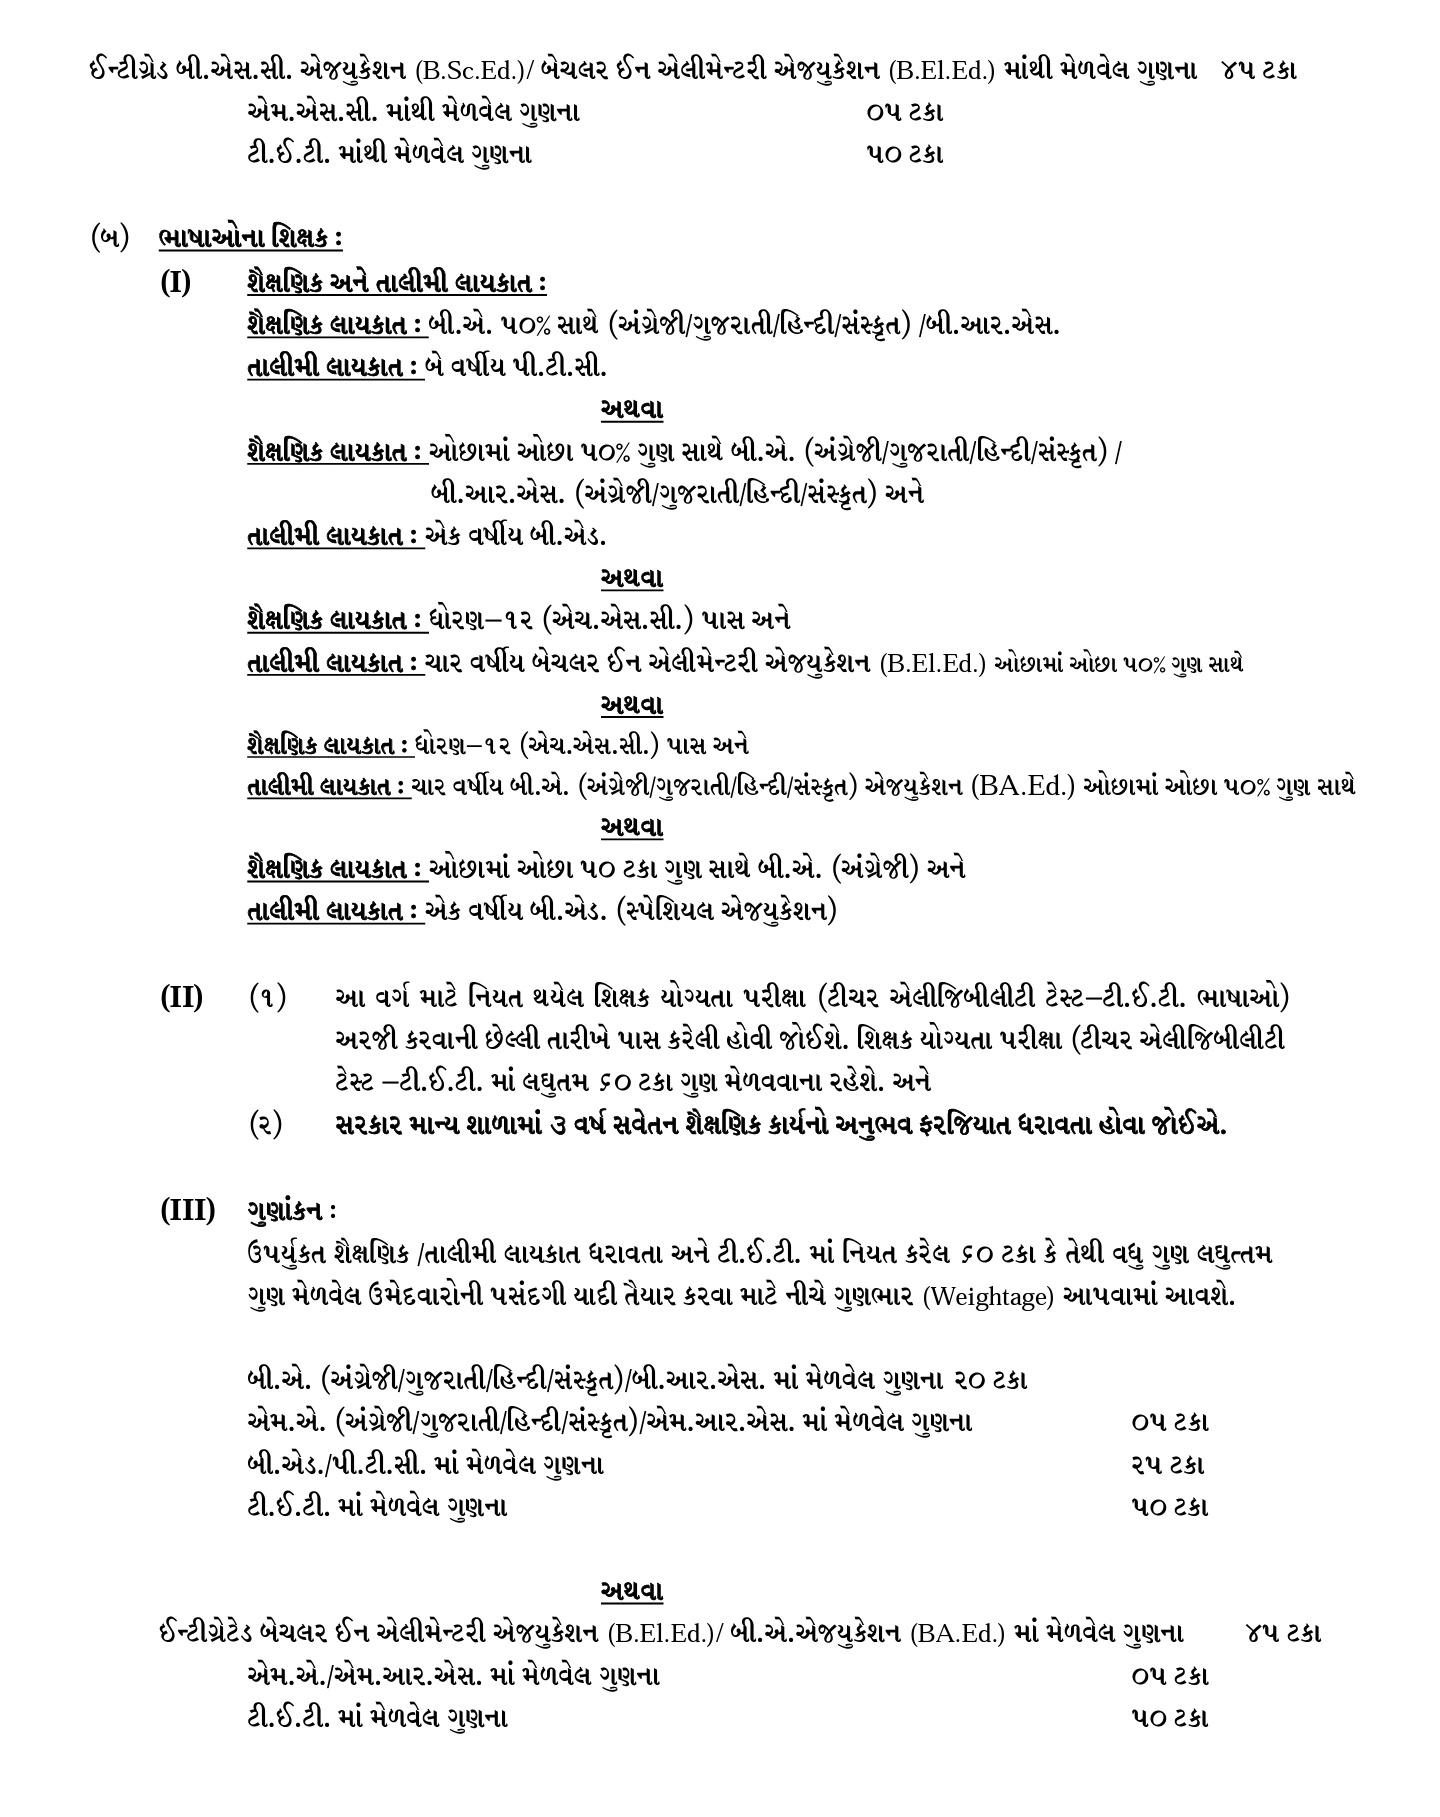 https://project303.blogspot.com/2021/05/ssa-karar-bharti.html